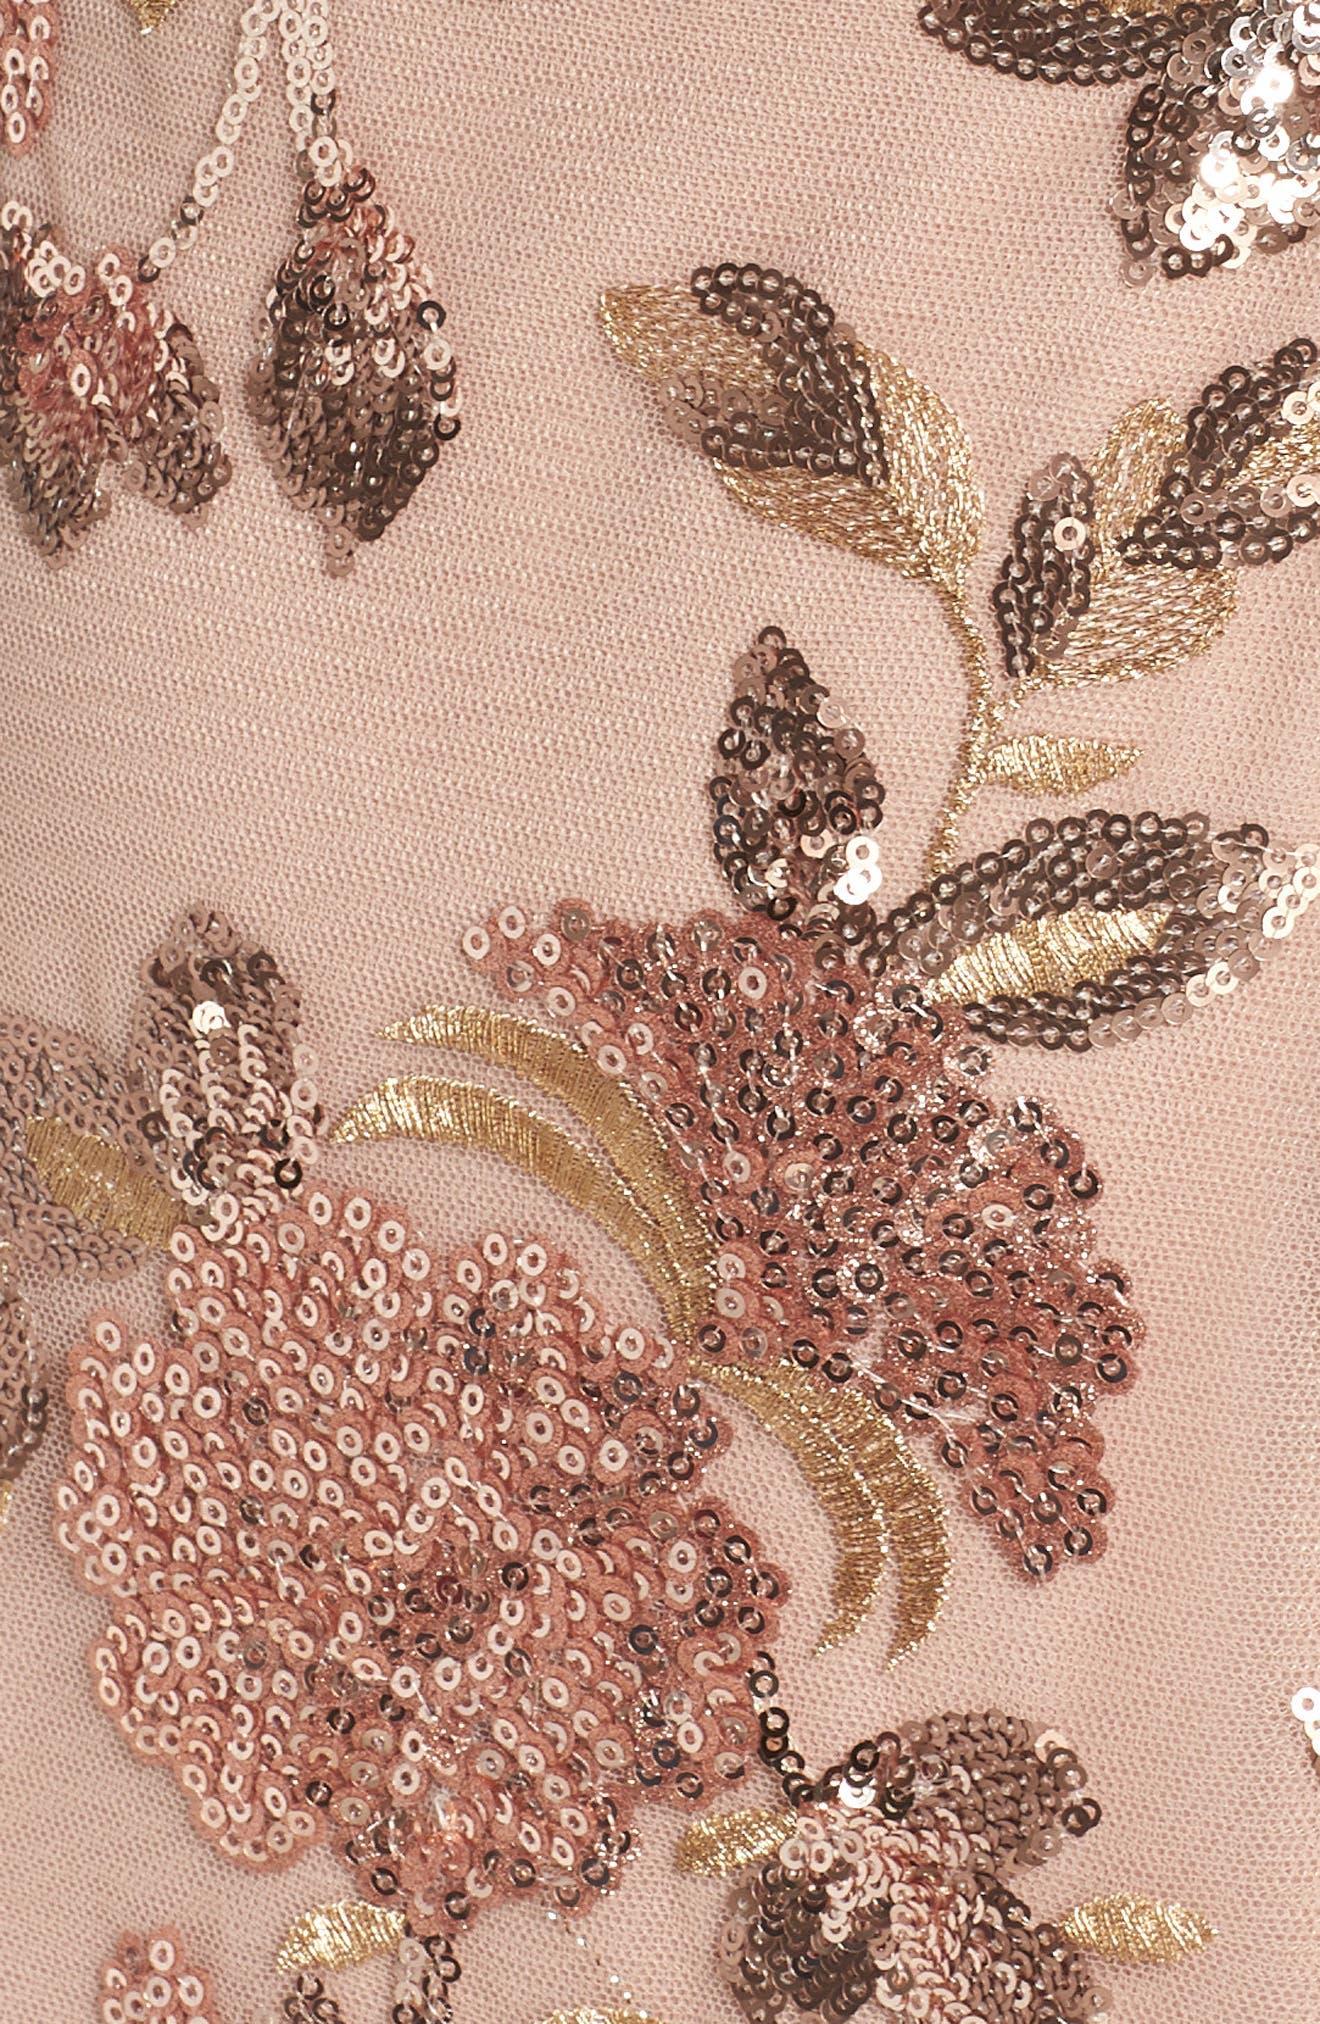 Metallic Floral Sequin Cocktail Dress,                             Alternate thumbnail 5, color,                             220